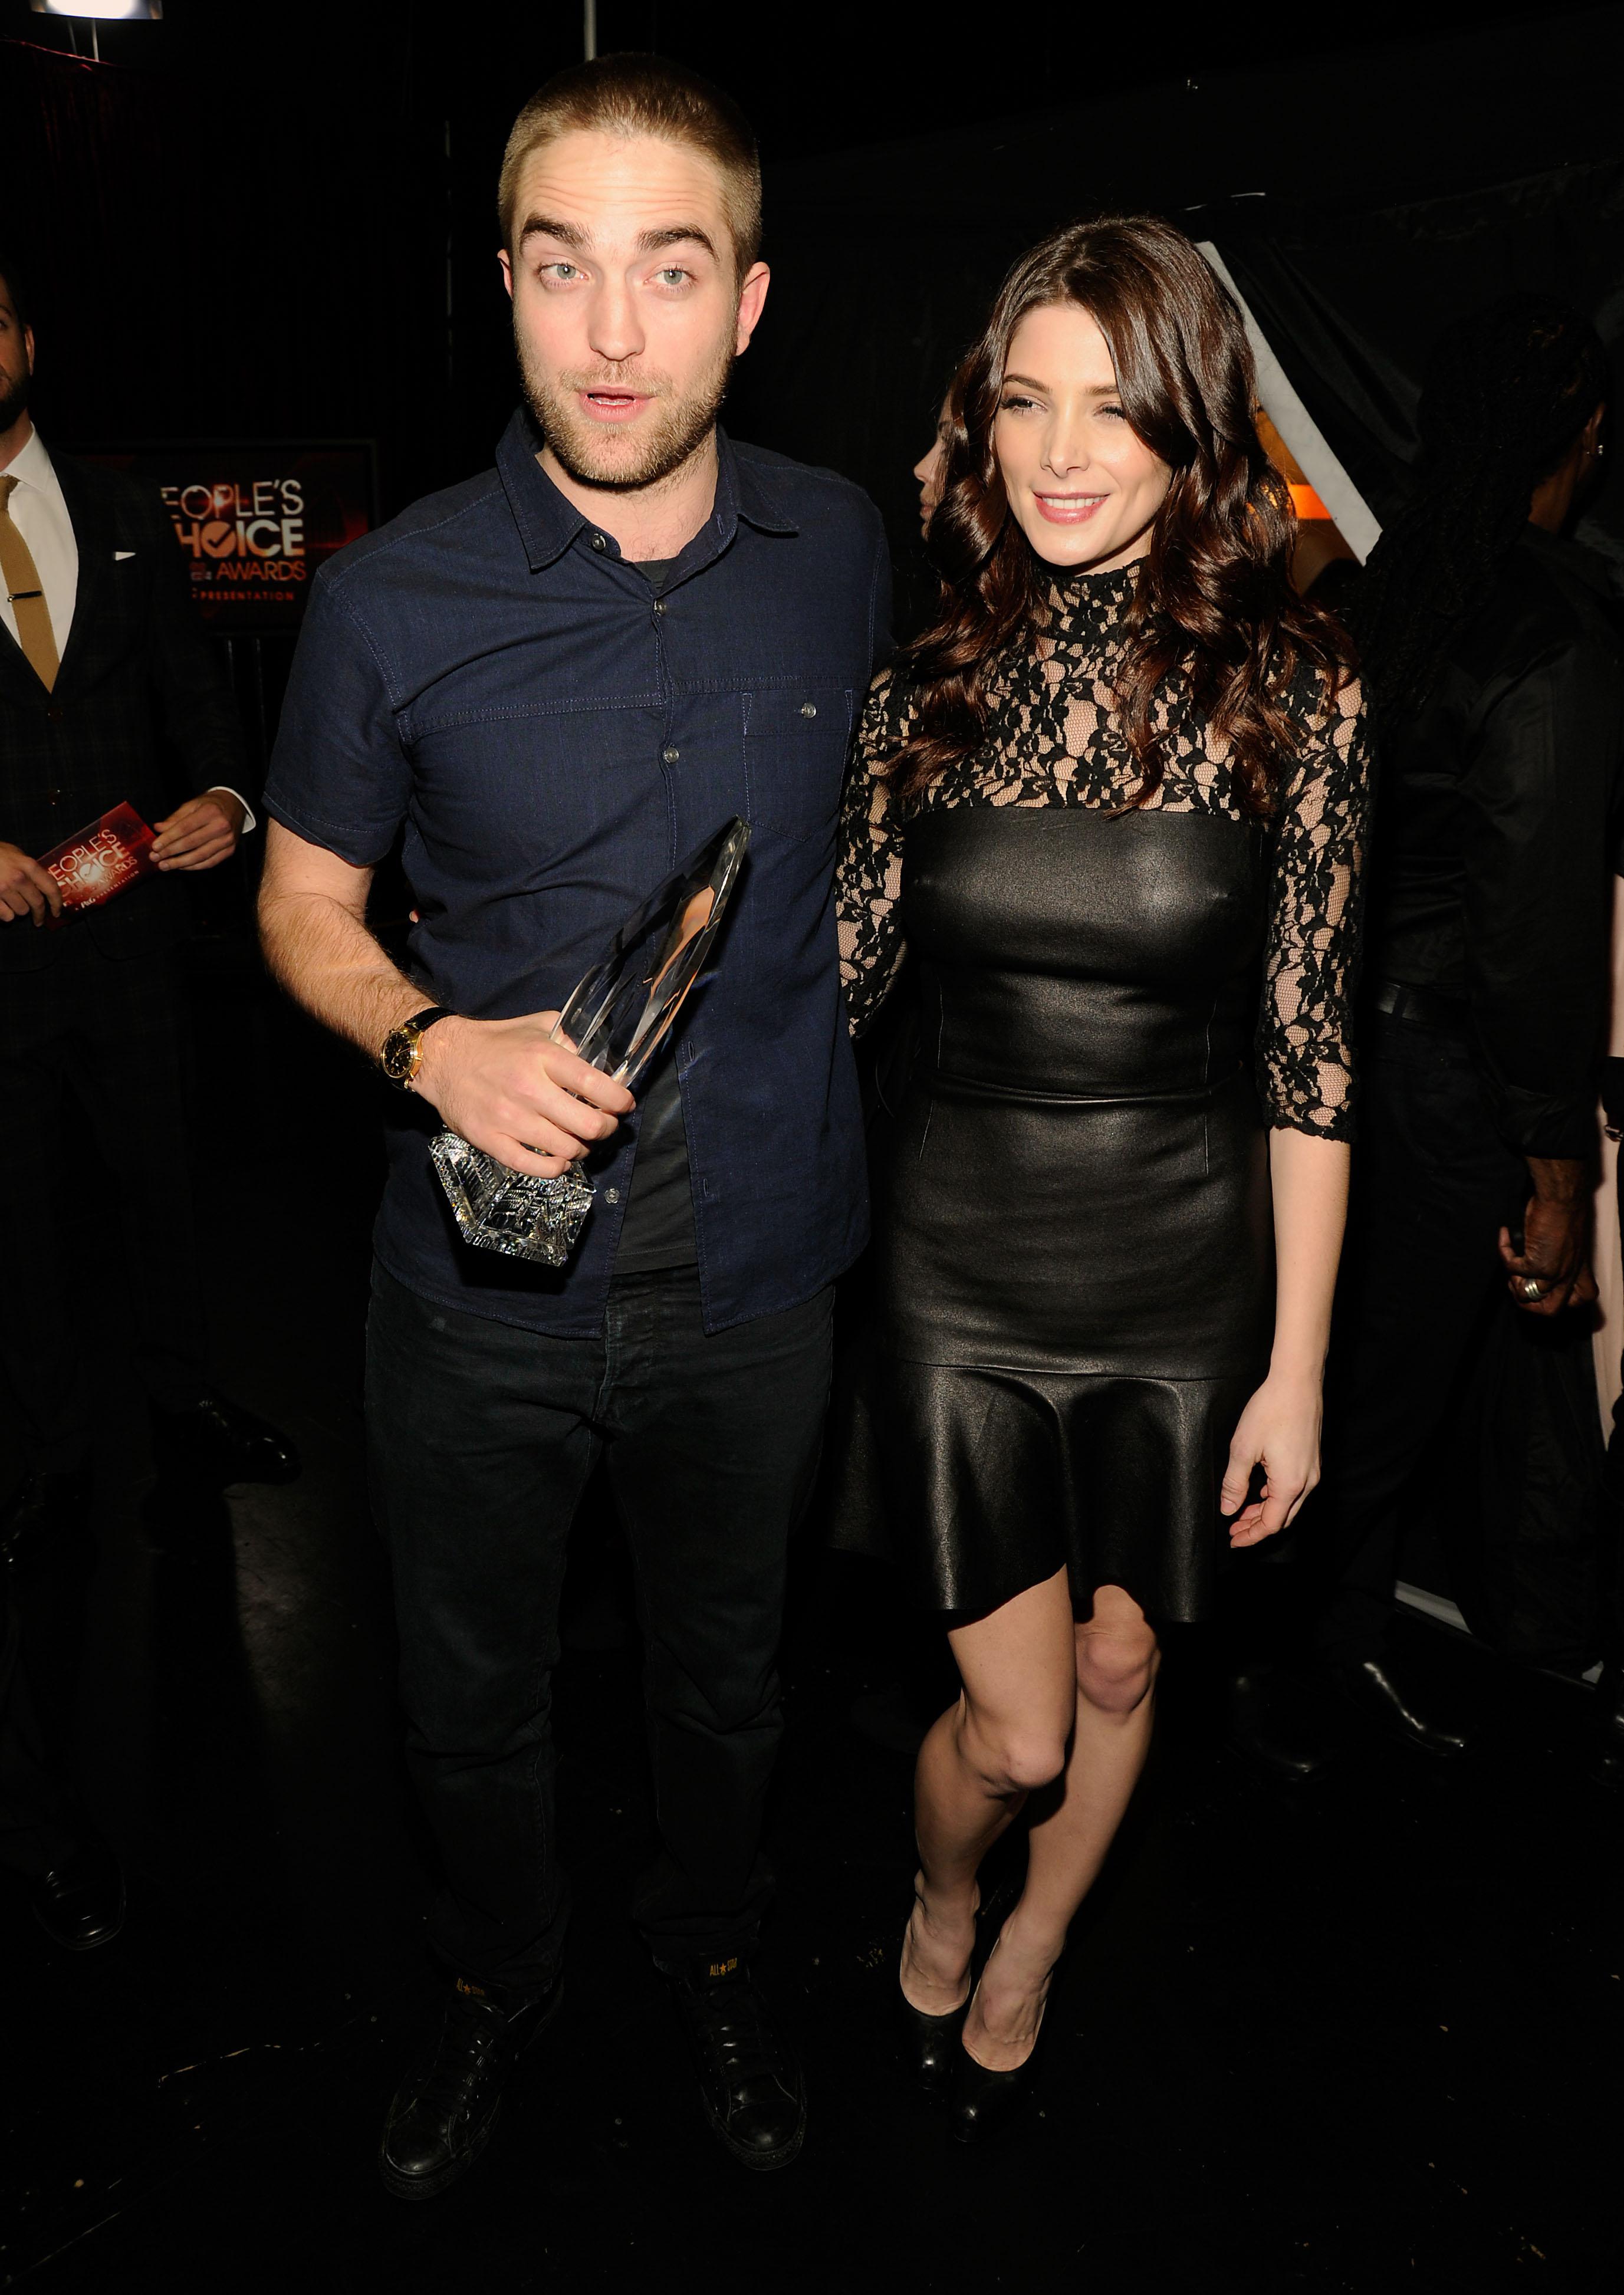 Robert Pattinson and Ashley Greene